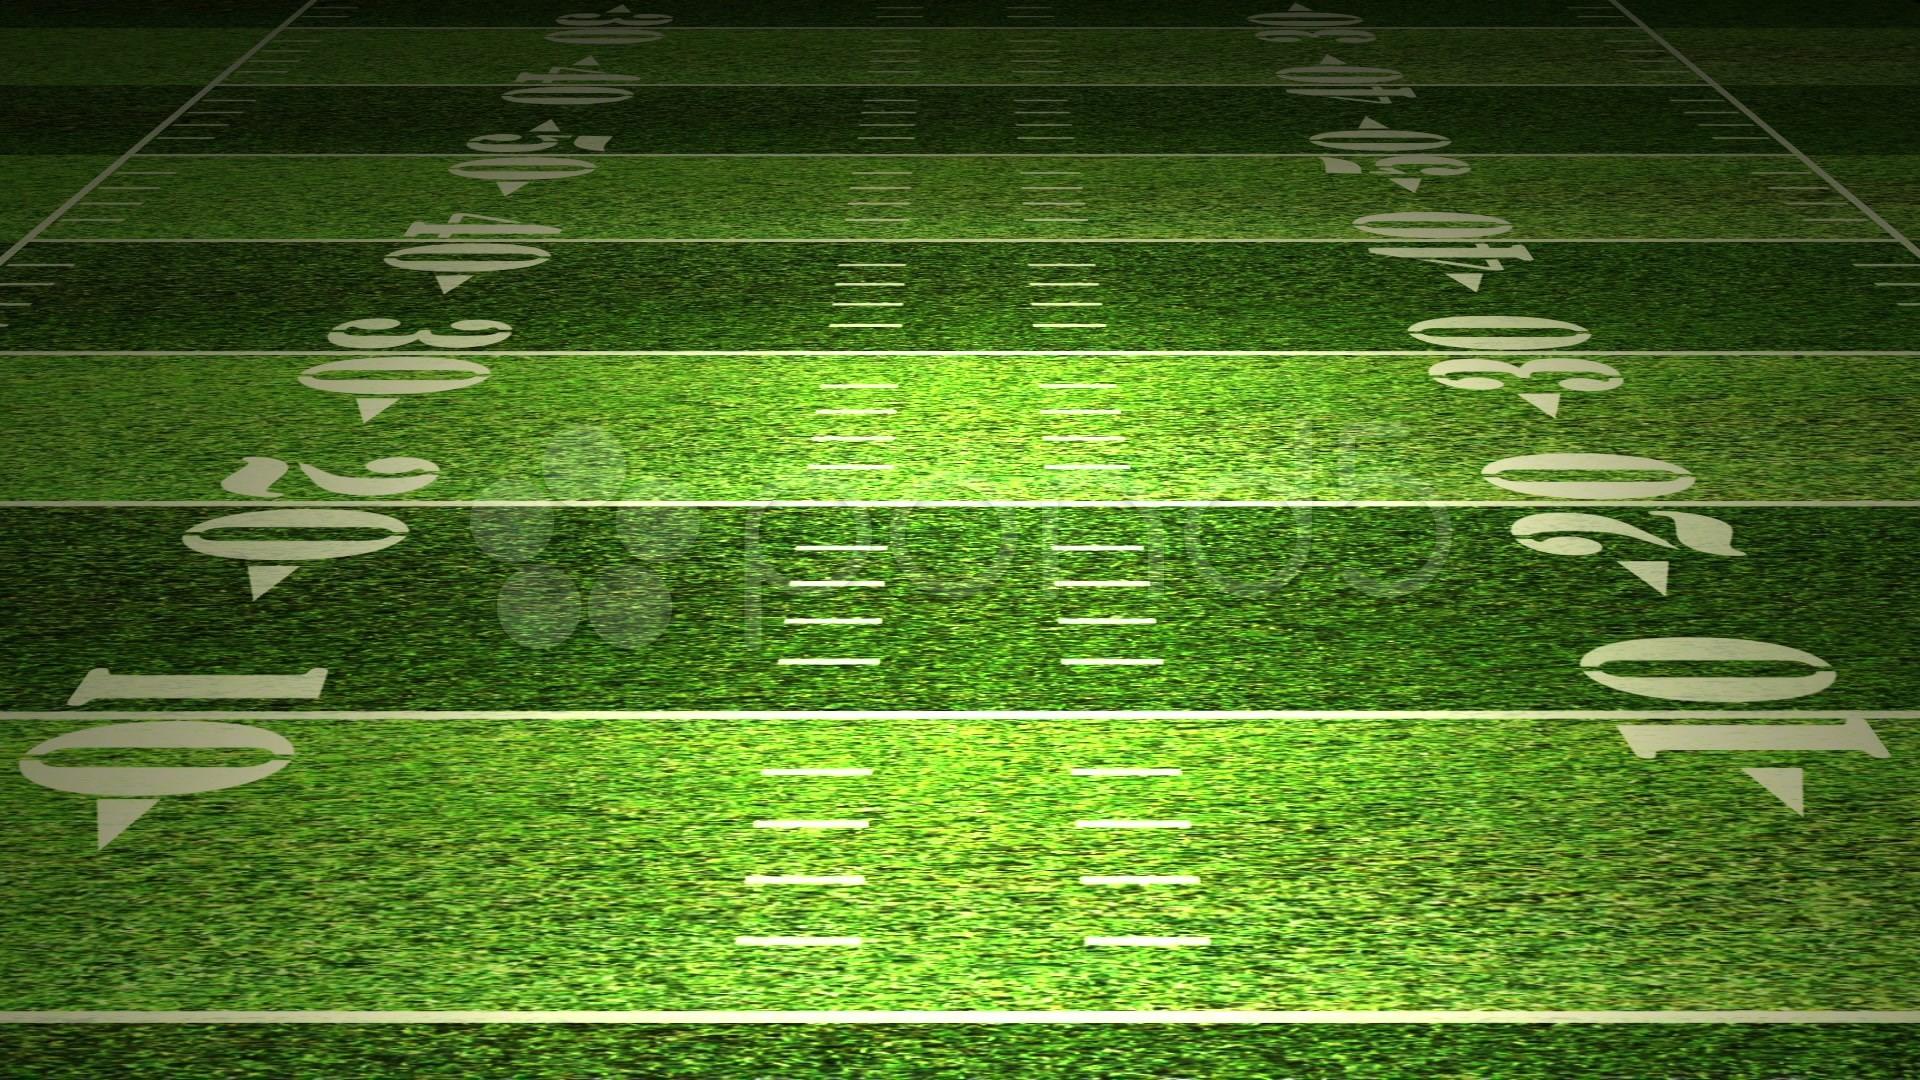 hd football field wallpapers